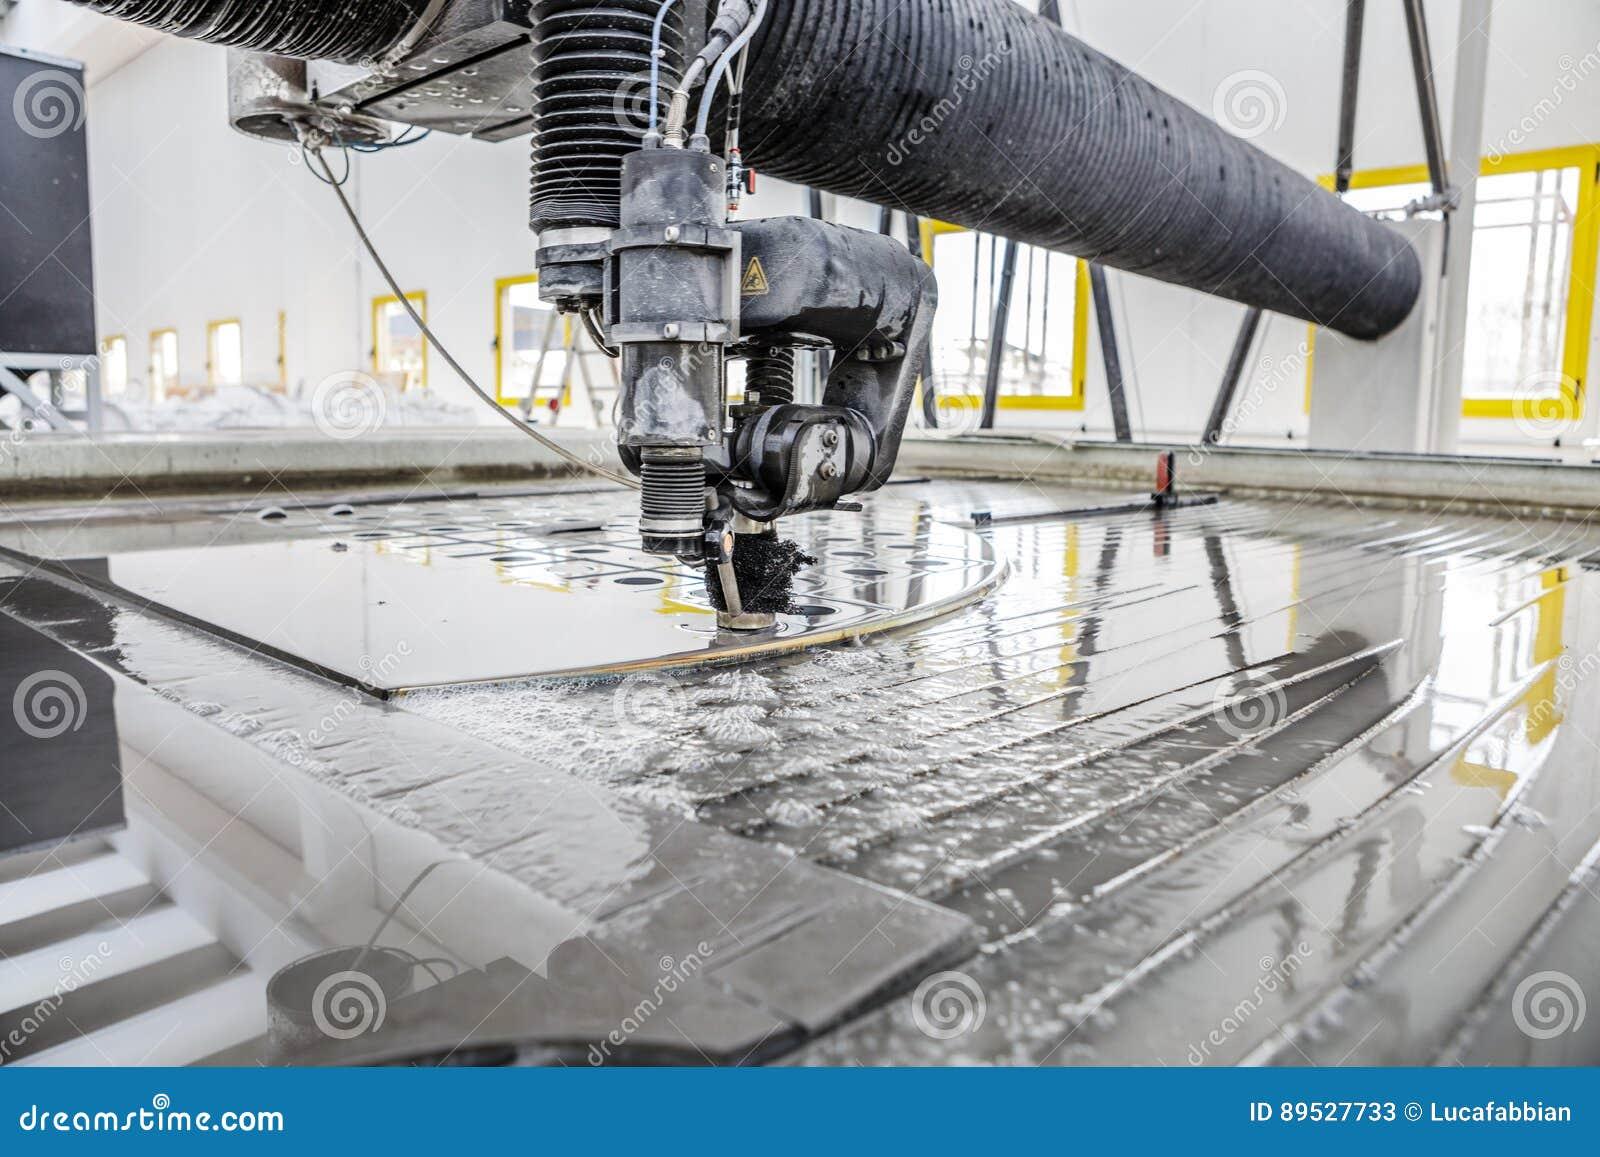 CNC Waterjet Cutting Machine Detail Stock Image - Image of cutting